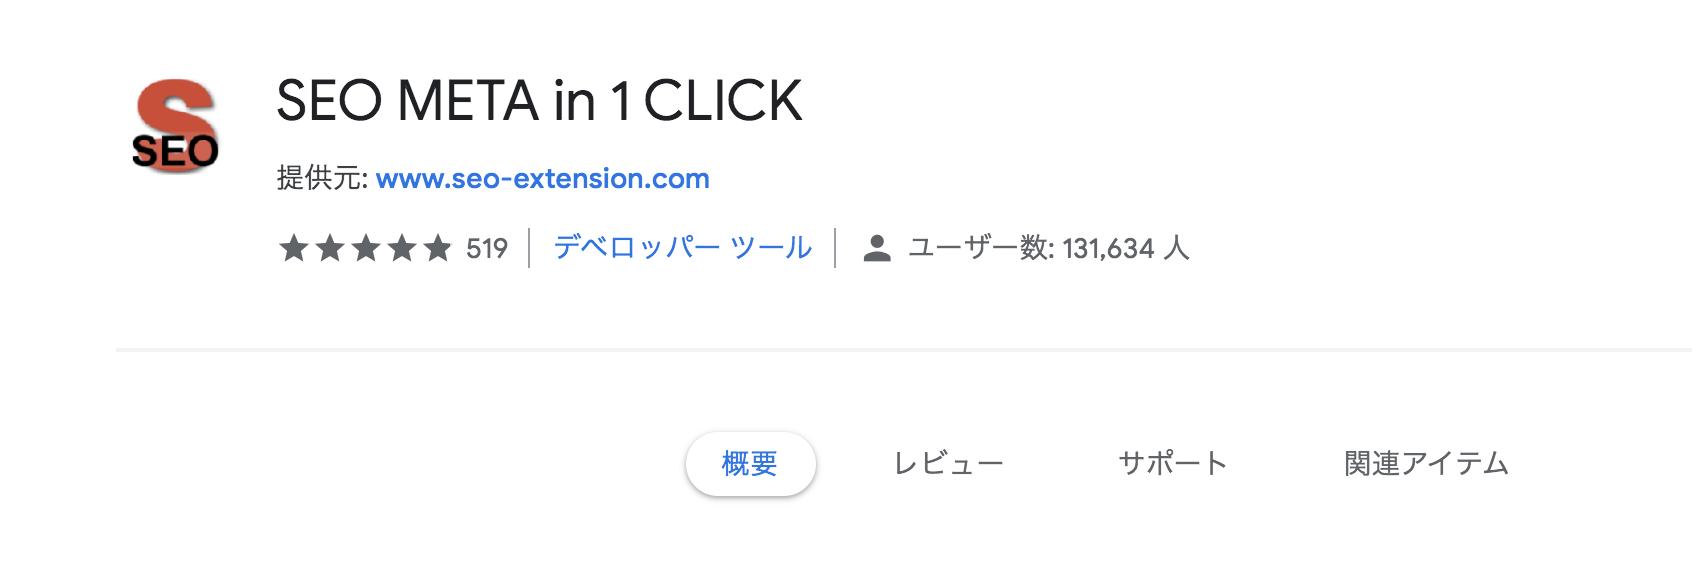 SEO対策 GoogleChrome 拡張機能SEO META in 1 CLICK